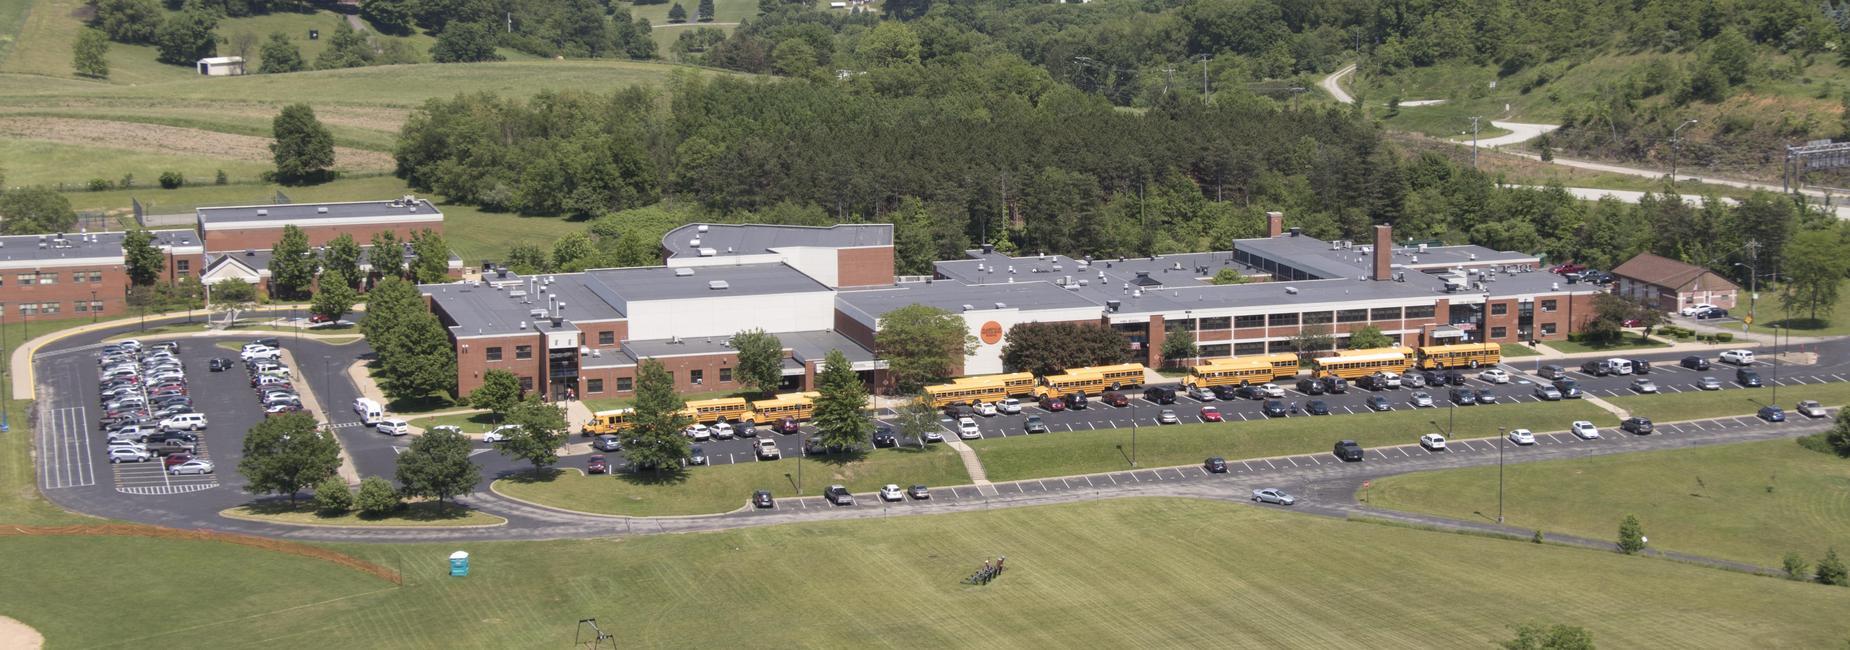 Blairsville Campus